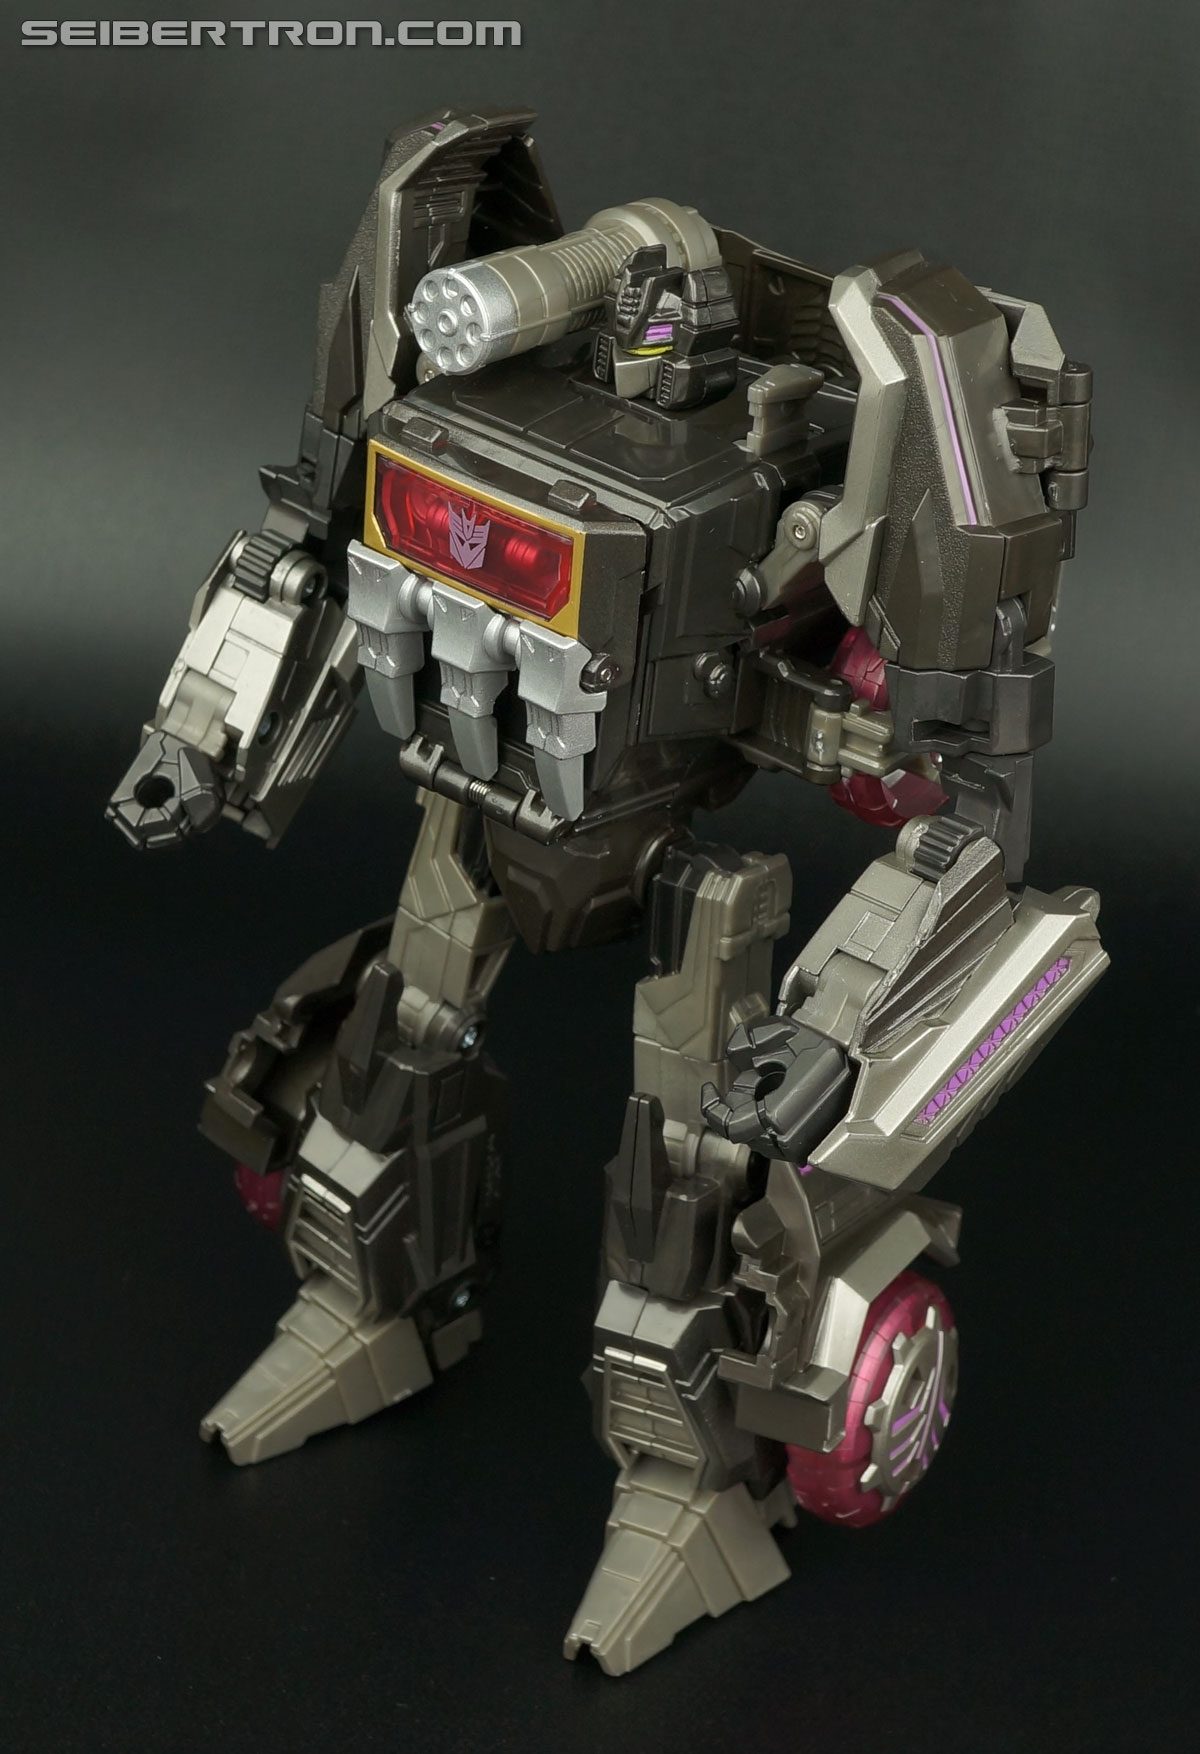 Transformers Generations Soundblaster (Image #64 of 120)